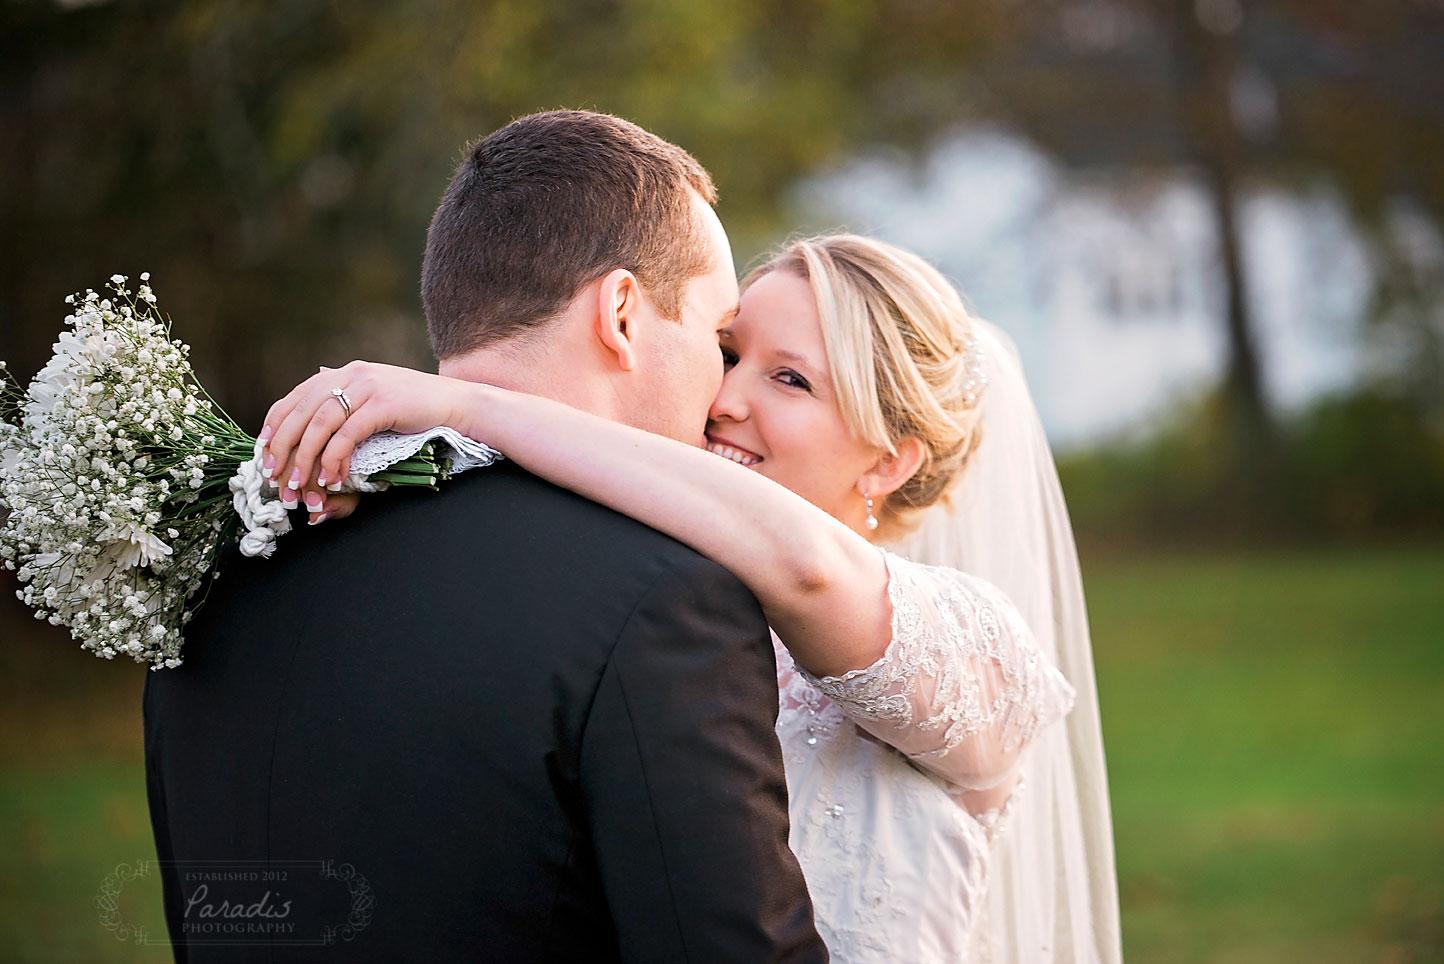 Happy Bride | Paradis Photography